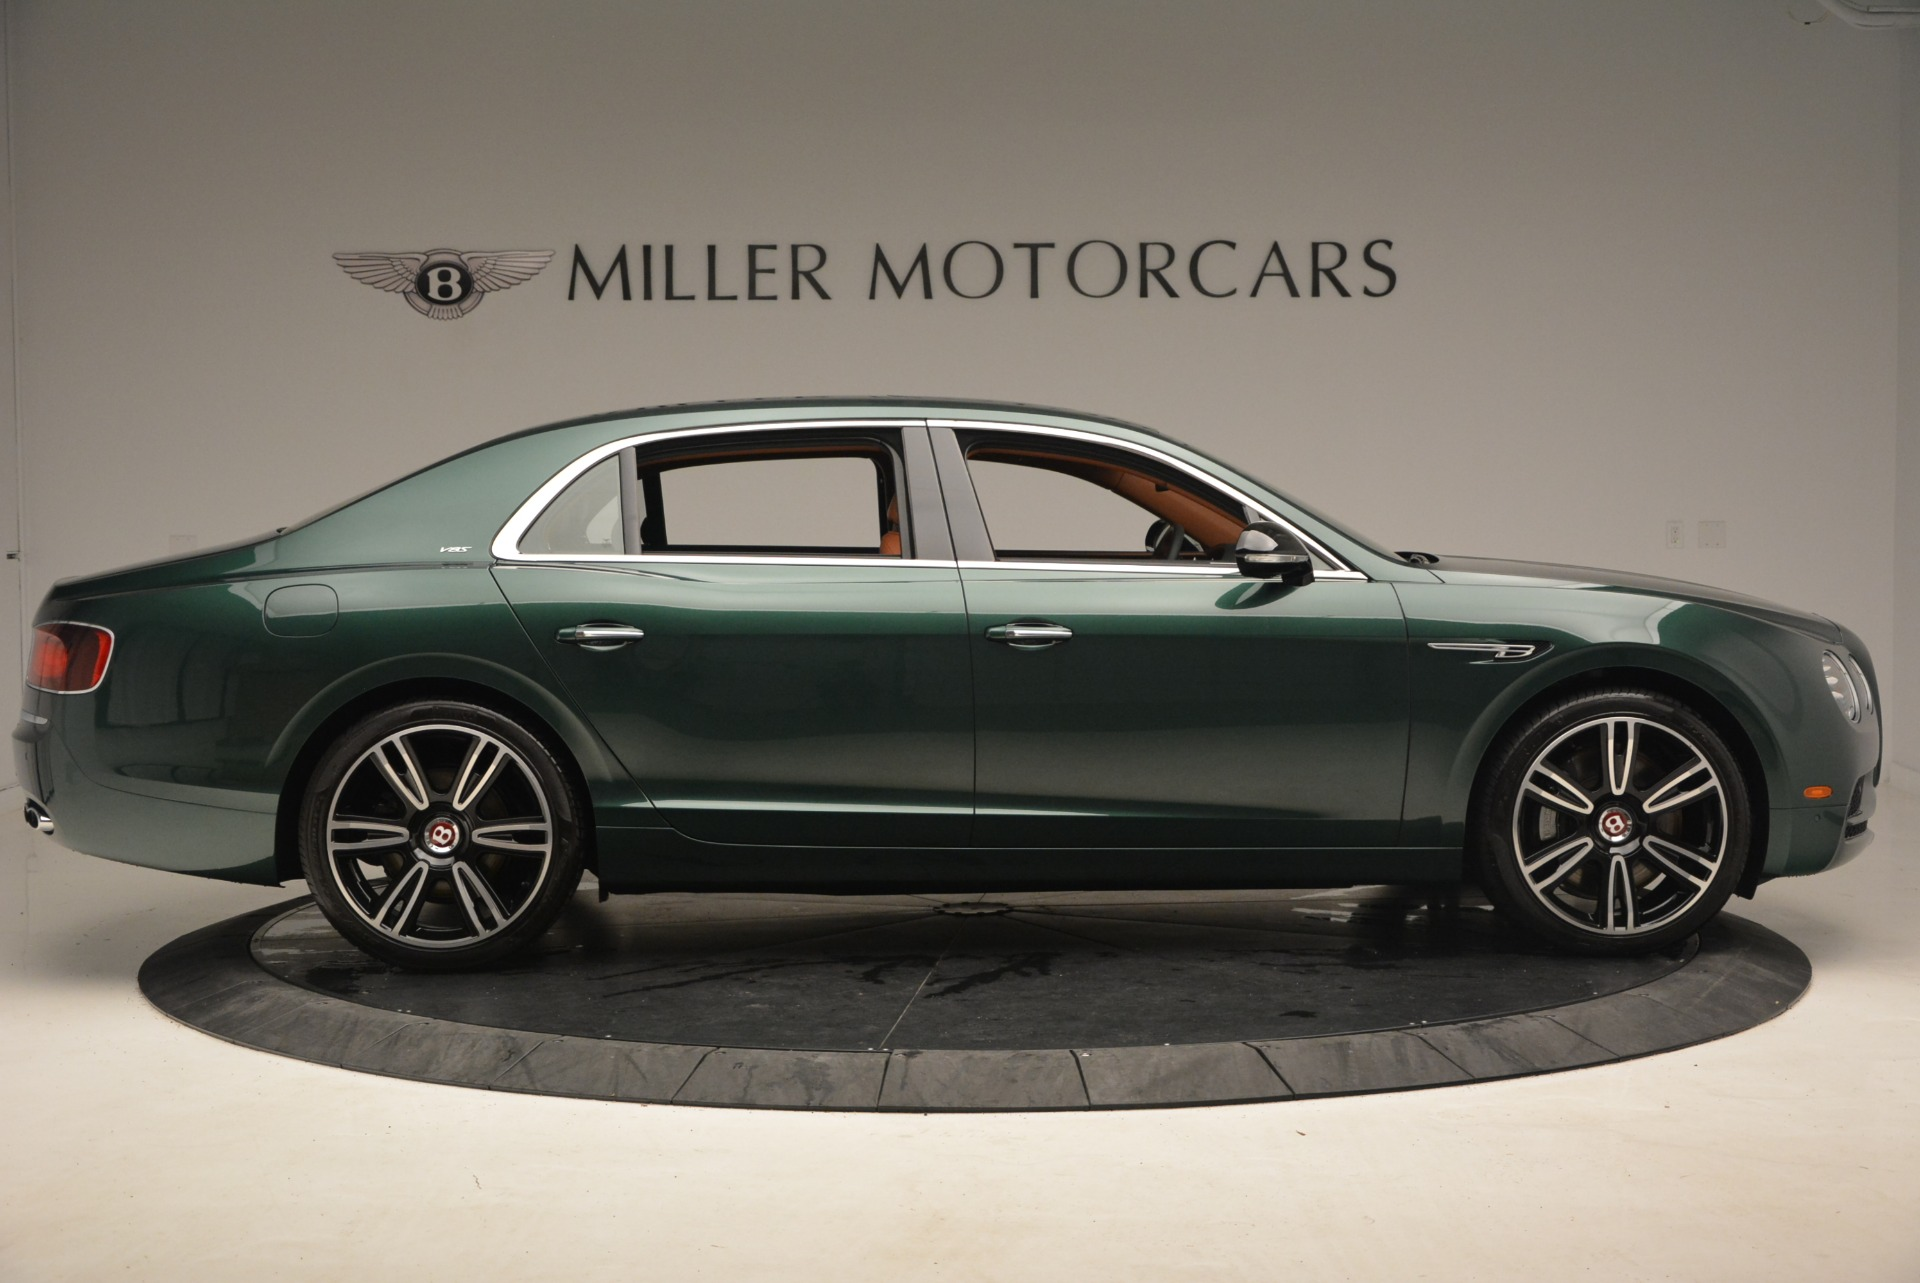 New 2017 Bentley Flying Spur V8 S For Sale In Westport, CT 1471_p9